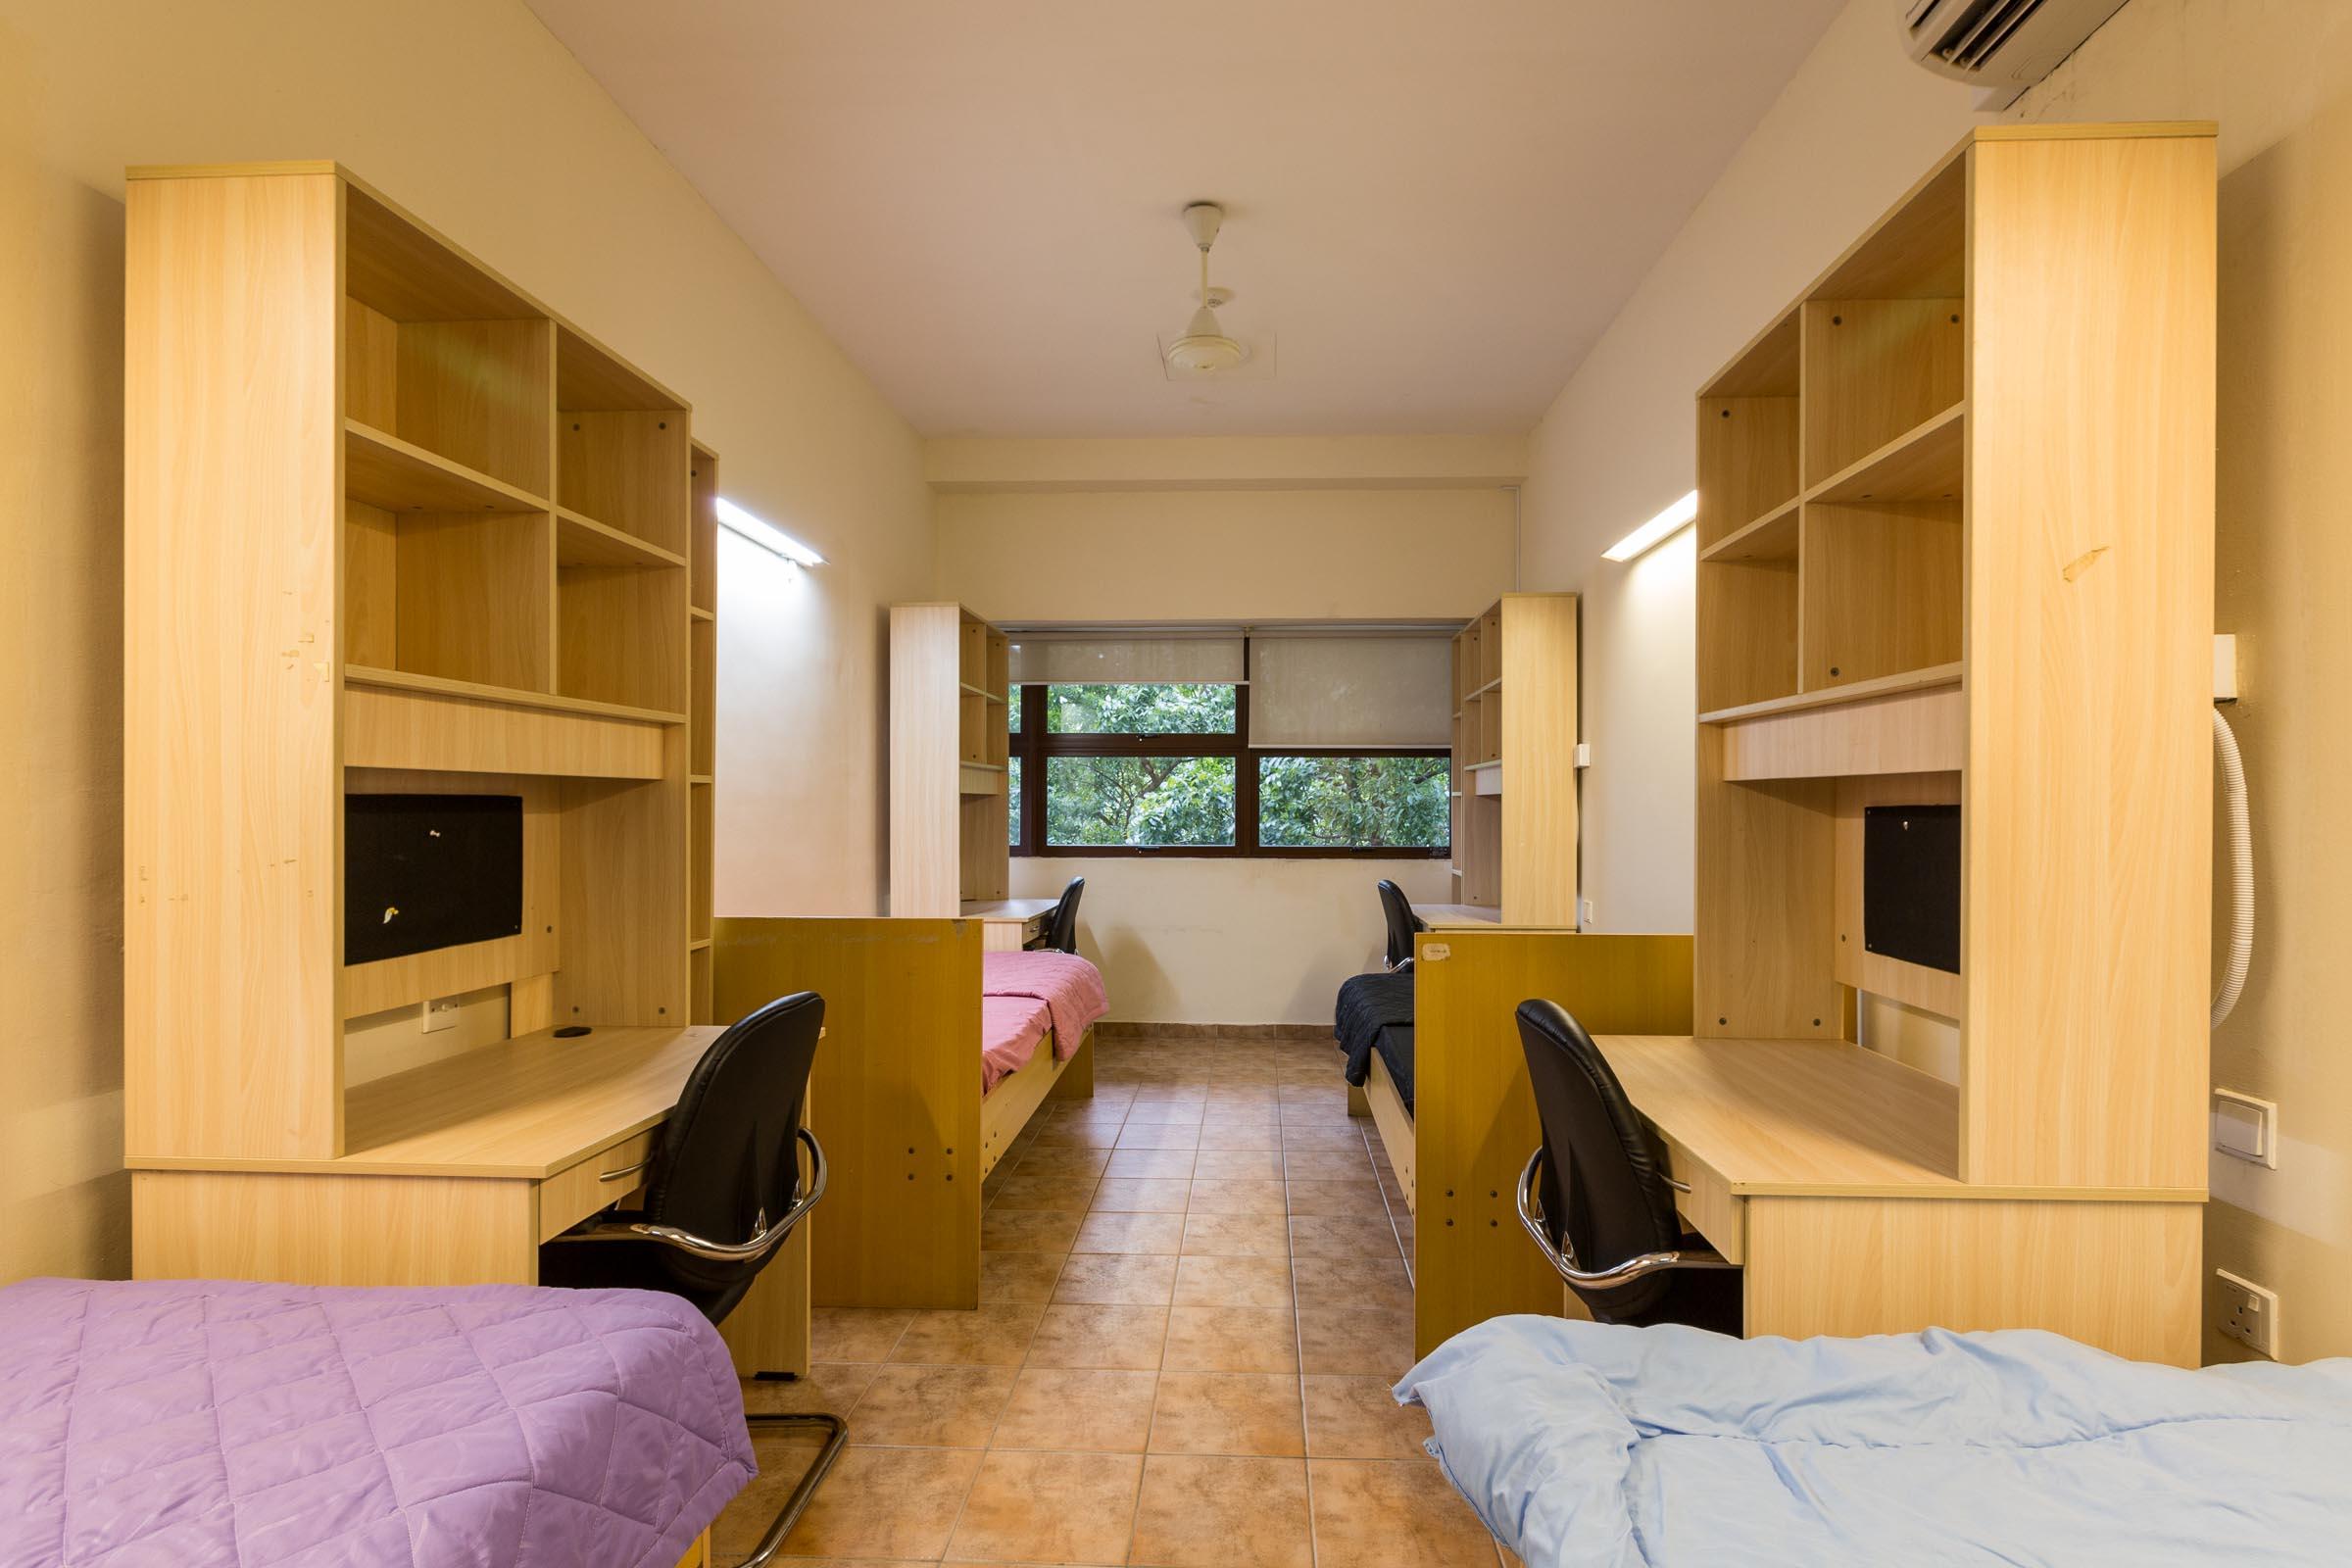 Singapore_accommodation_bedroom_1.jpg